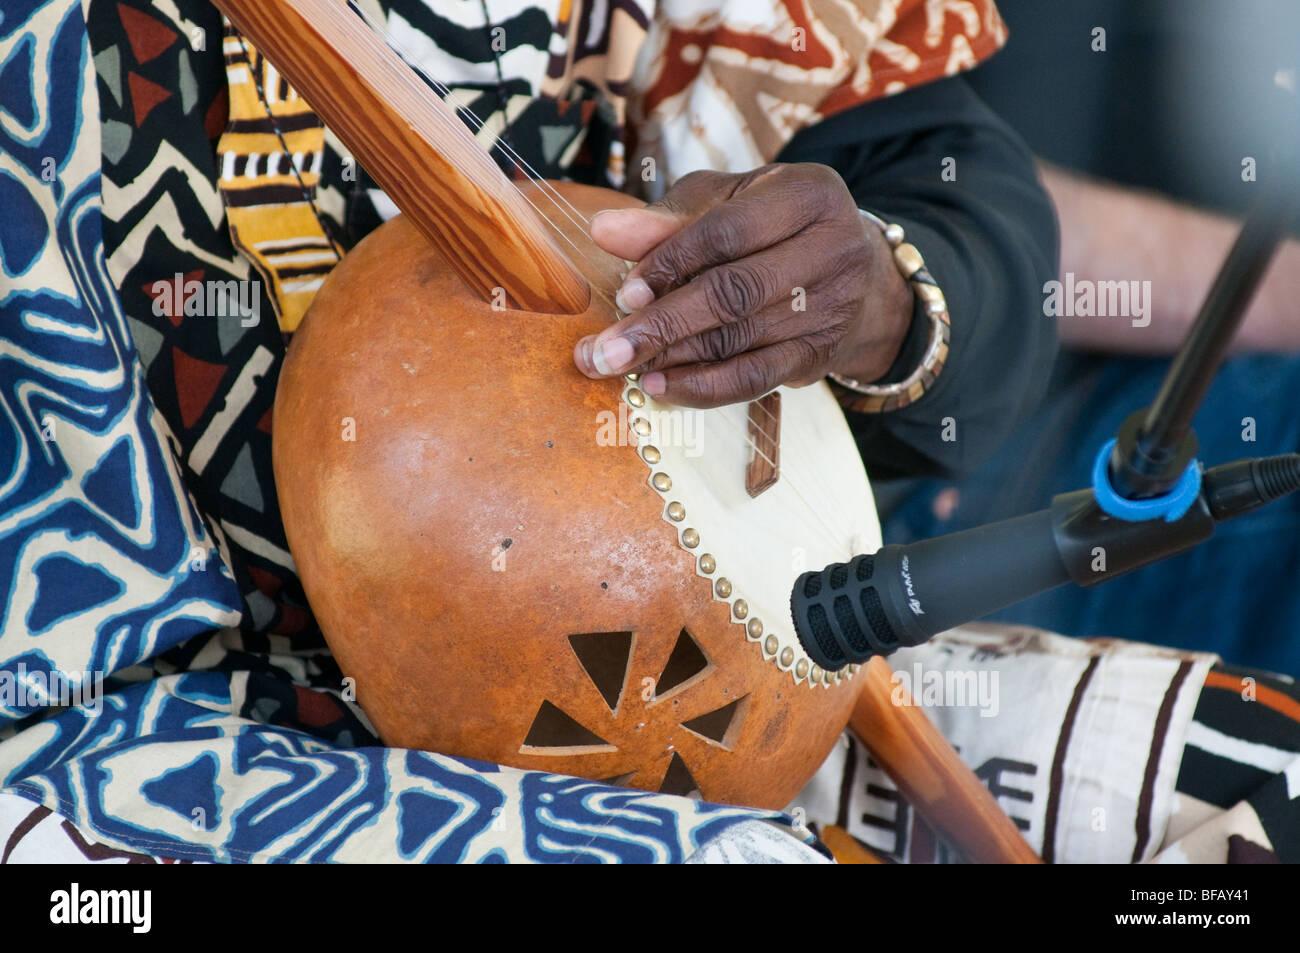 West african gourd banjo - Stock Image